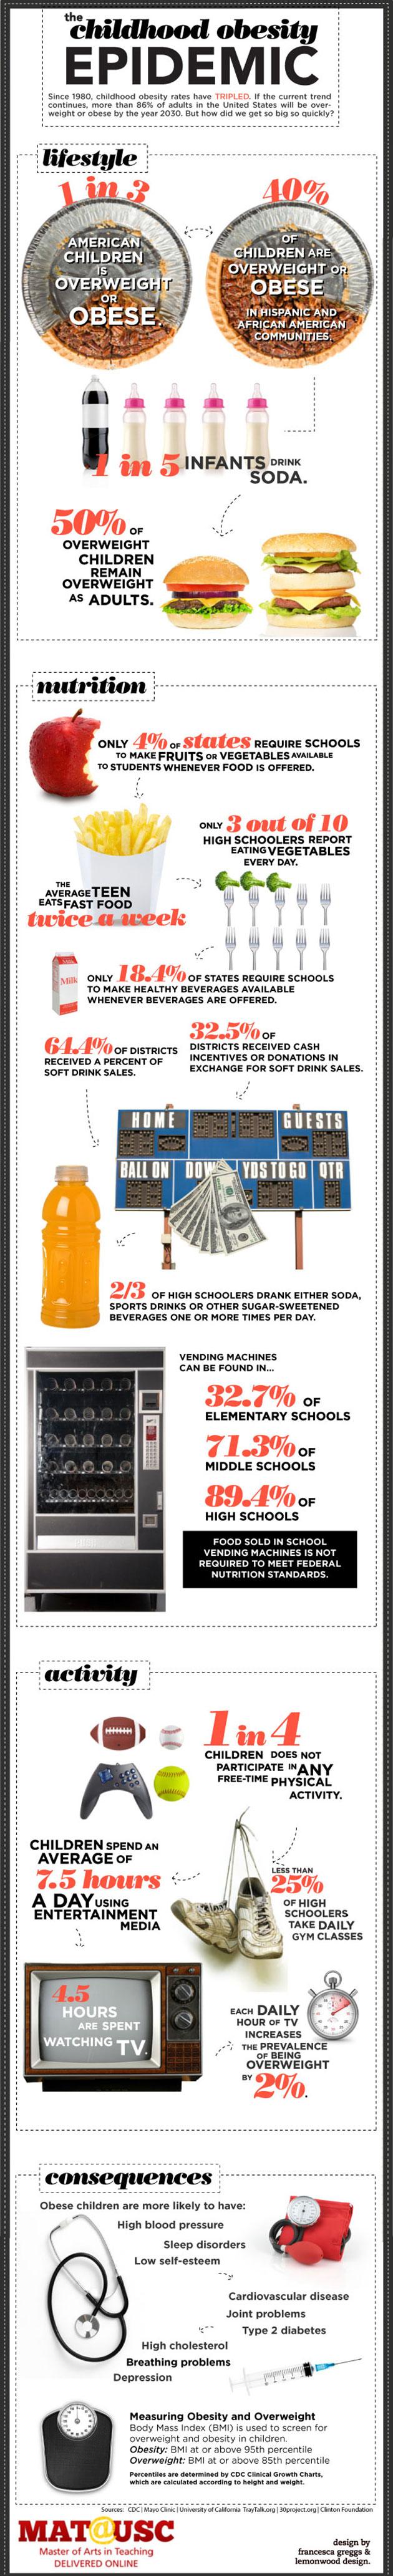 Obesity Epidemic In Children Infographic